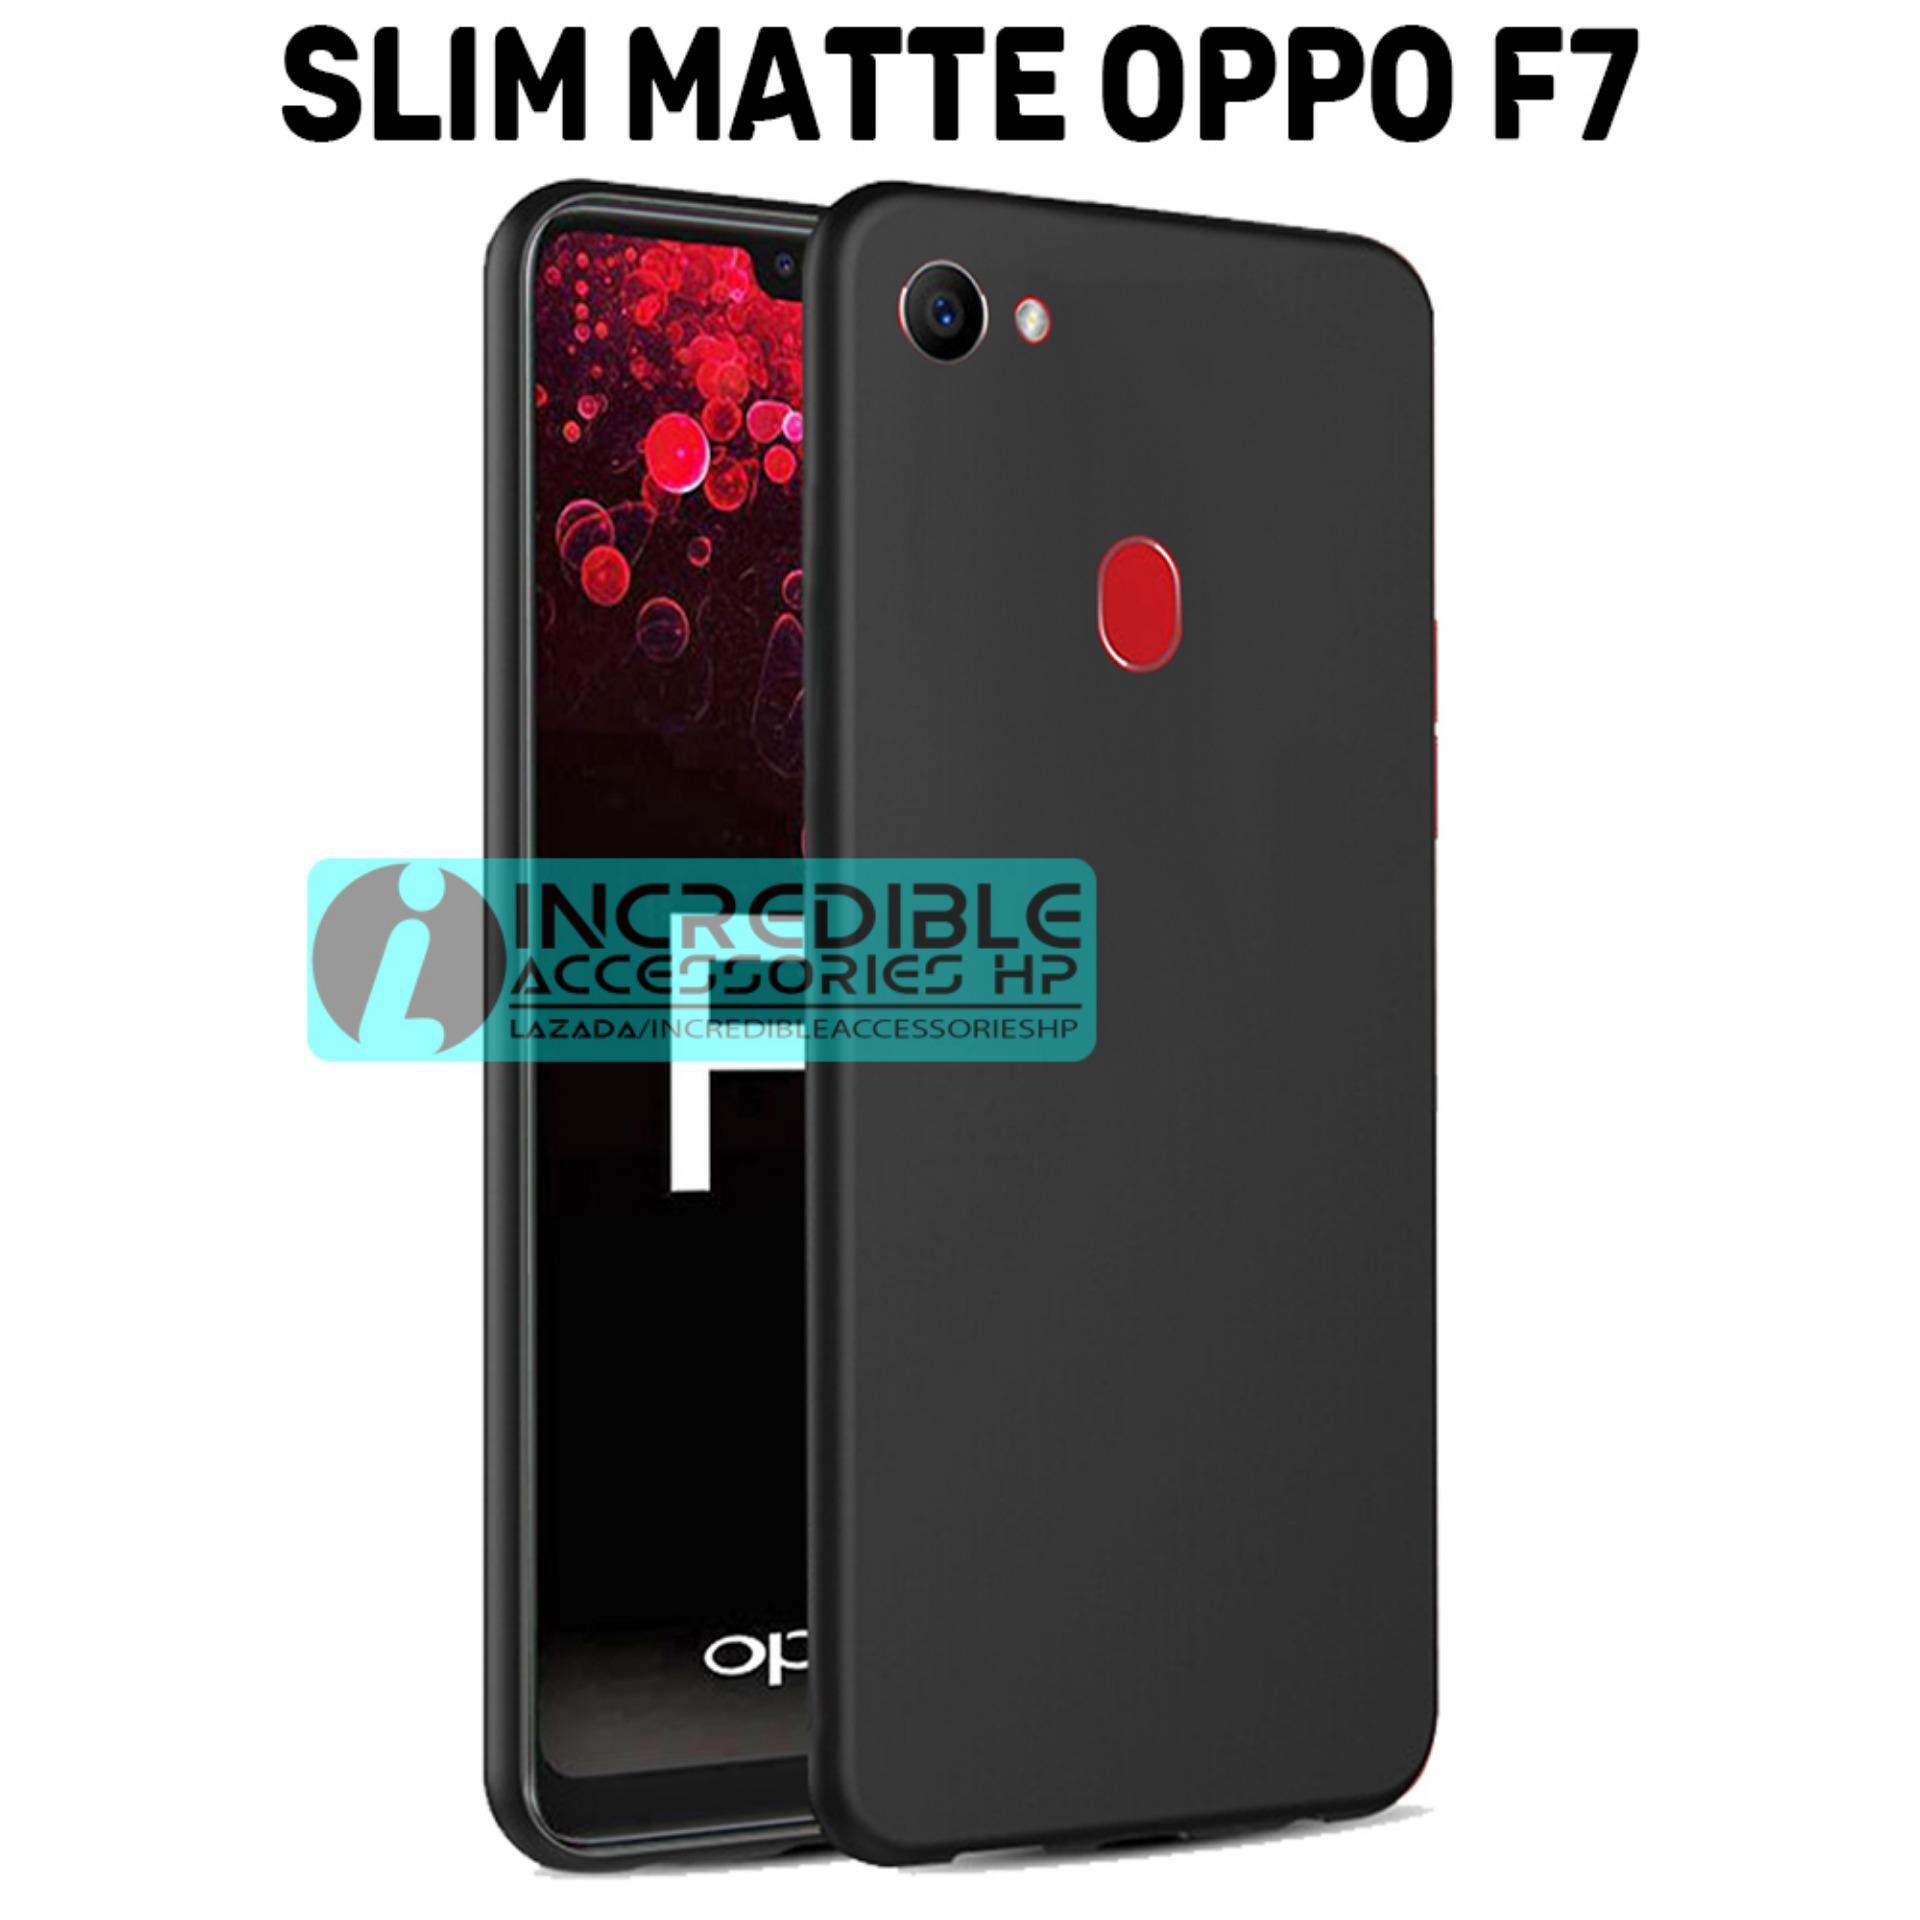 Case Slim Black Matte Baby Skin Softcase Premium Matte for Oppo F7 - Black